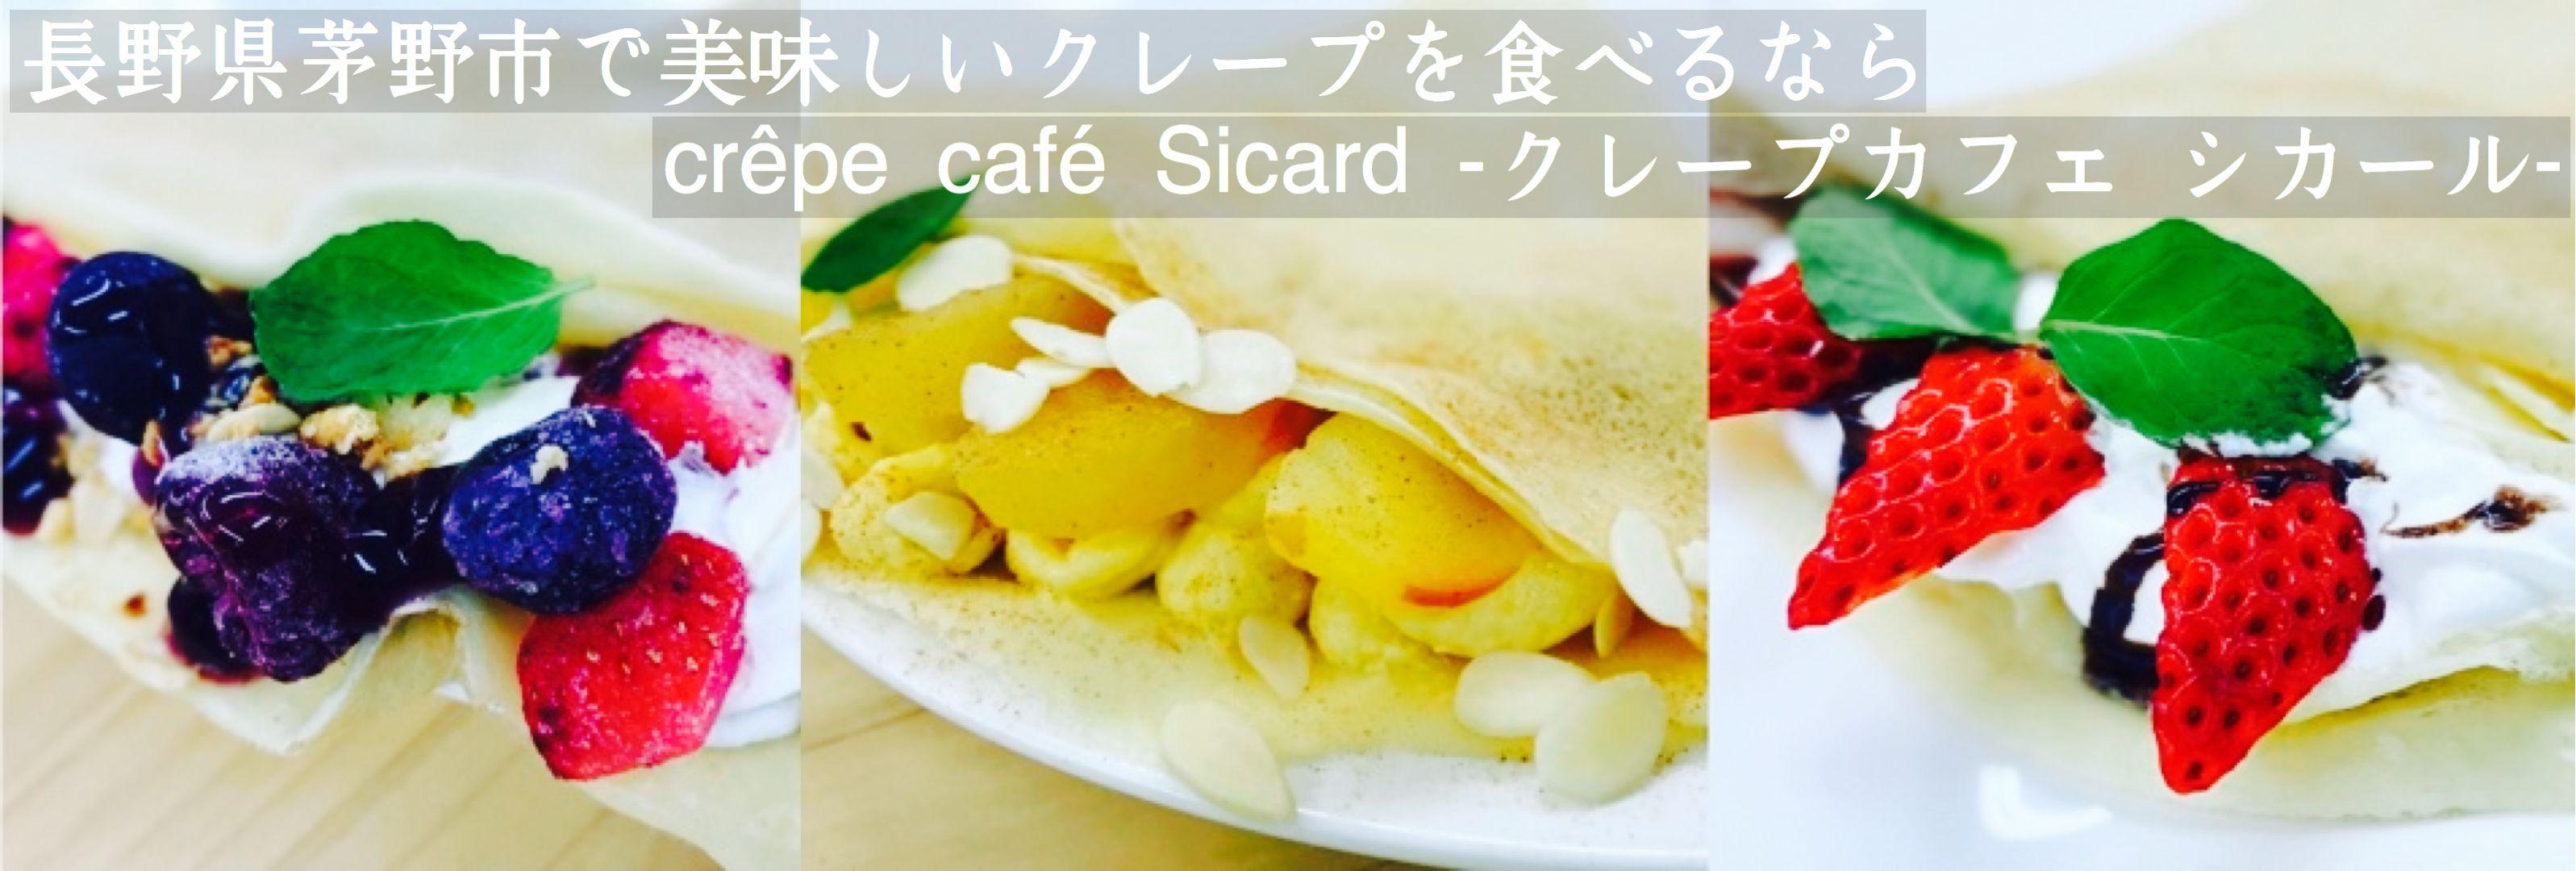 Café de Sicard~カフェ・ドゥ・シカール~